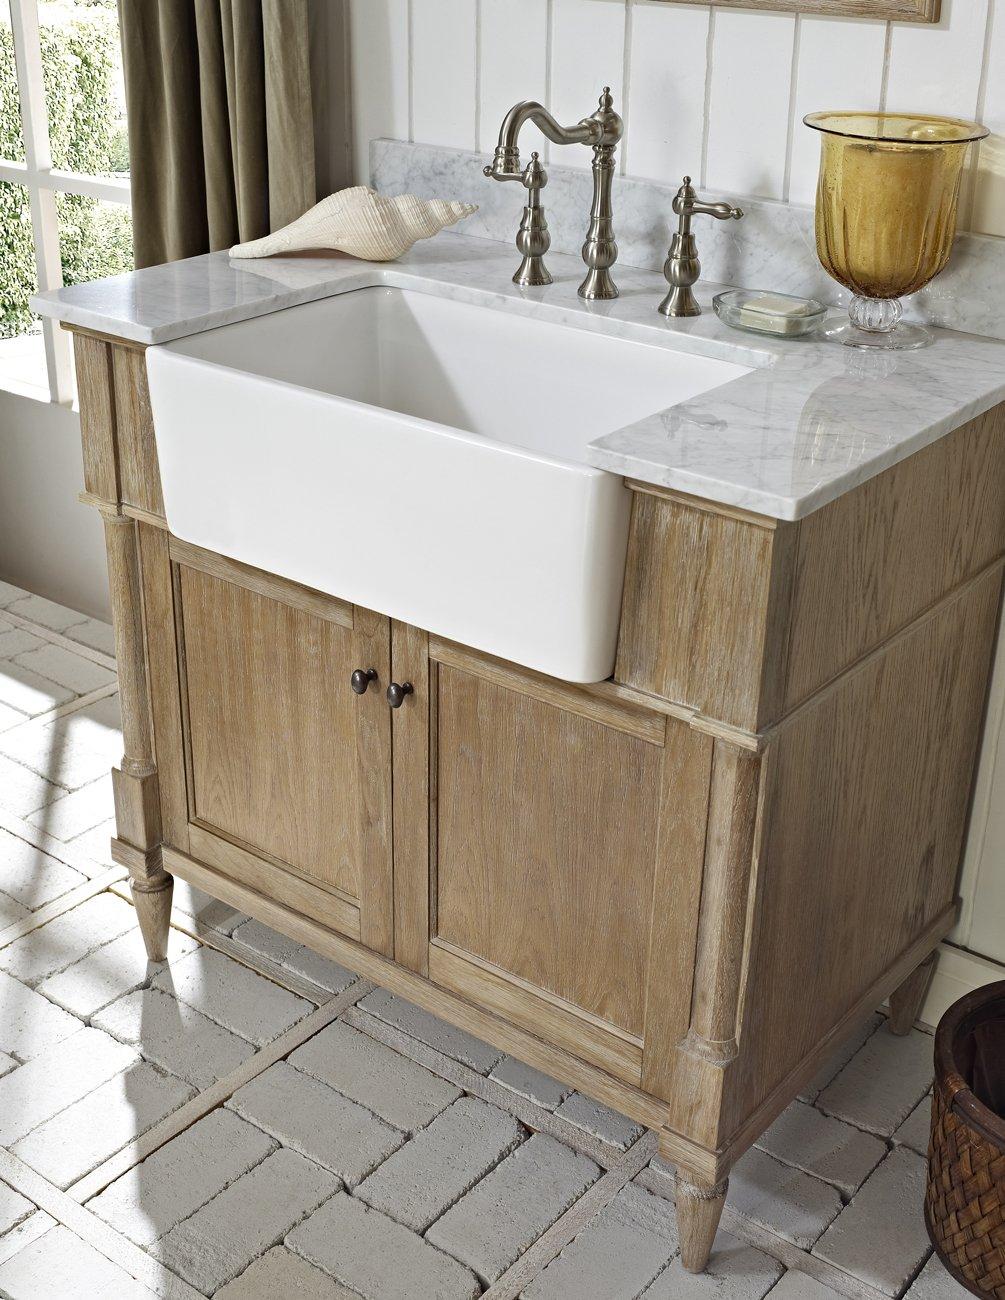 Rustic chic bathroom - Fairmont Designs 142 Fv36 Rustic Chic 36 Farmhouse Vanity Weathered Oak Amazon Com